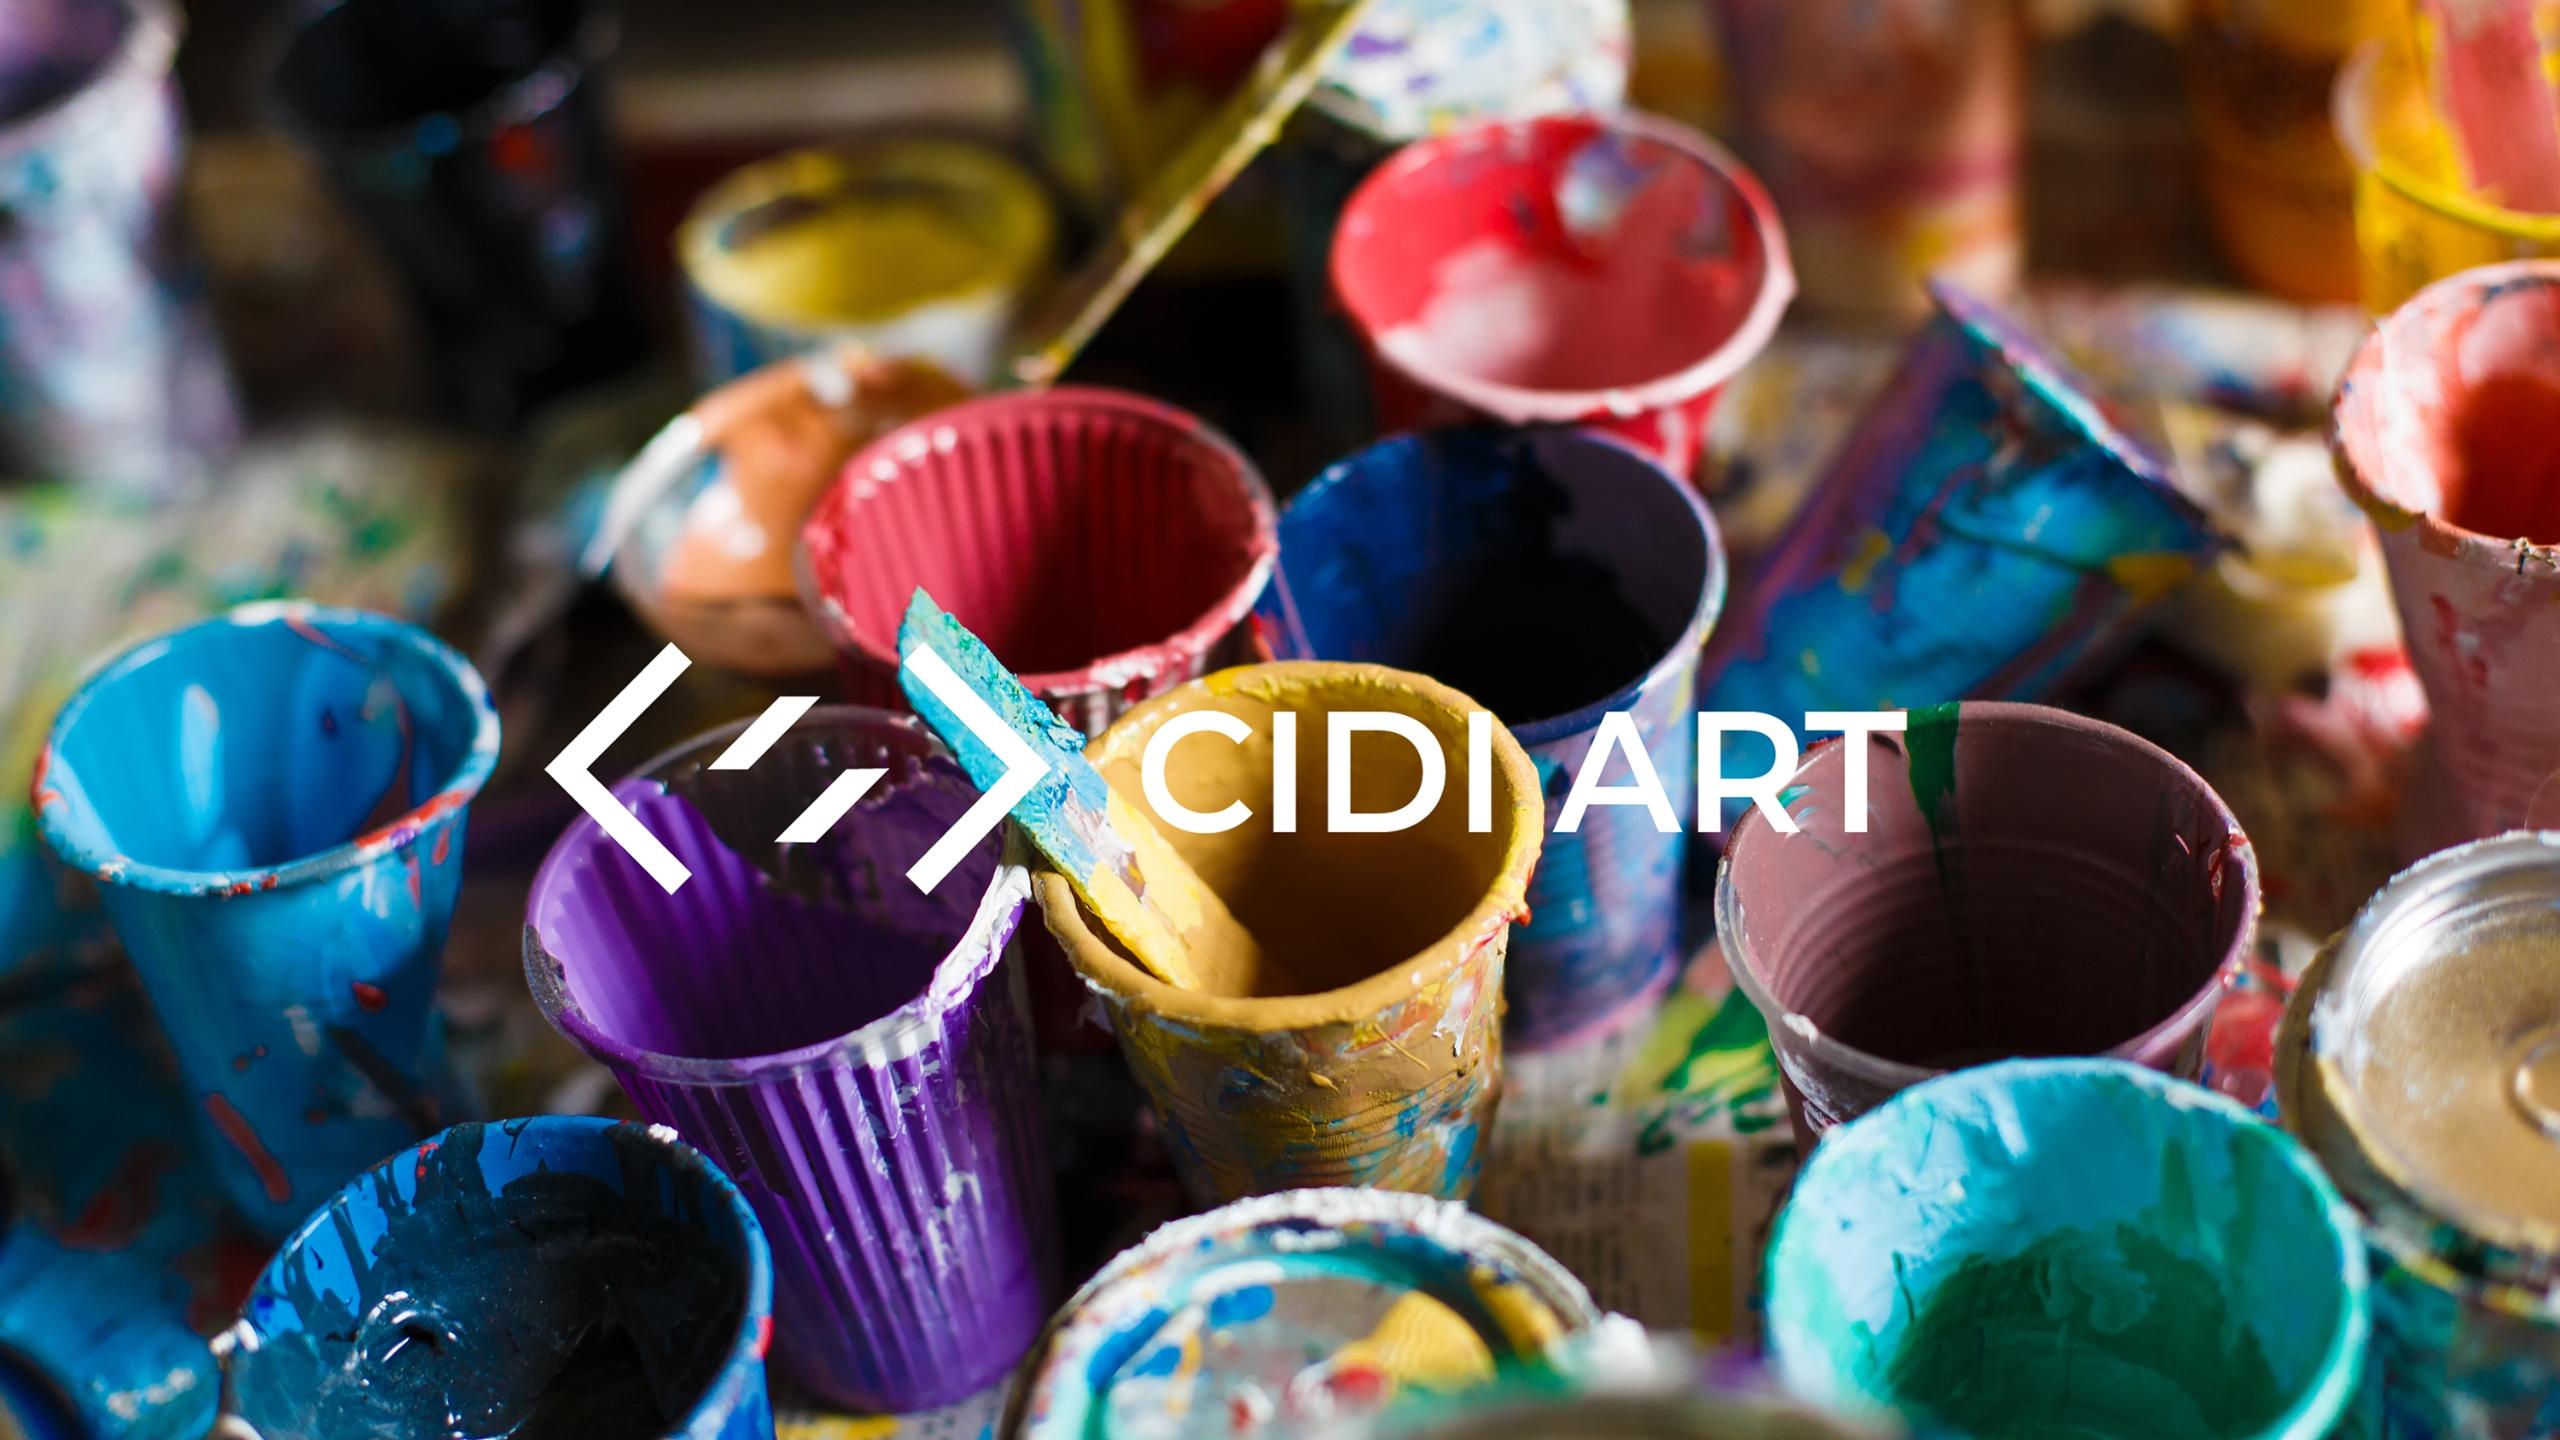 Vẽ Tranh Tường CIDI - CIDIART (@cidiart) Cover Image